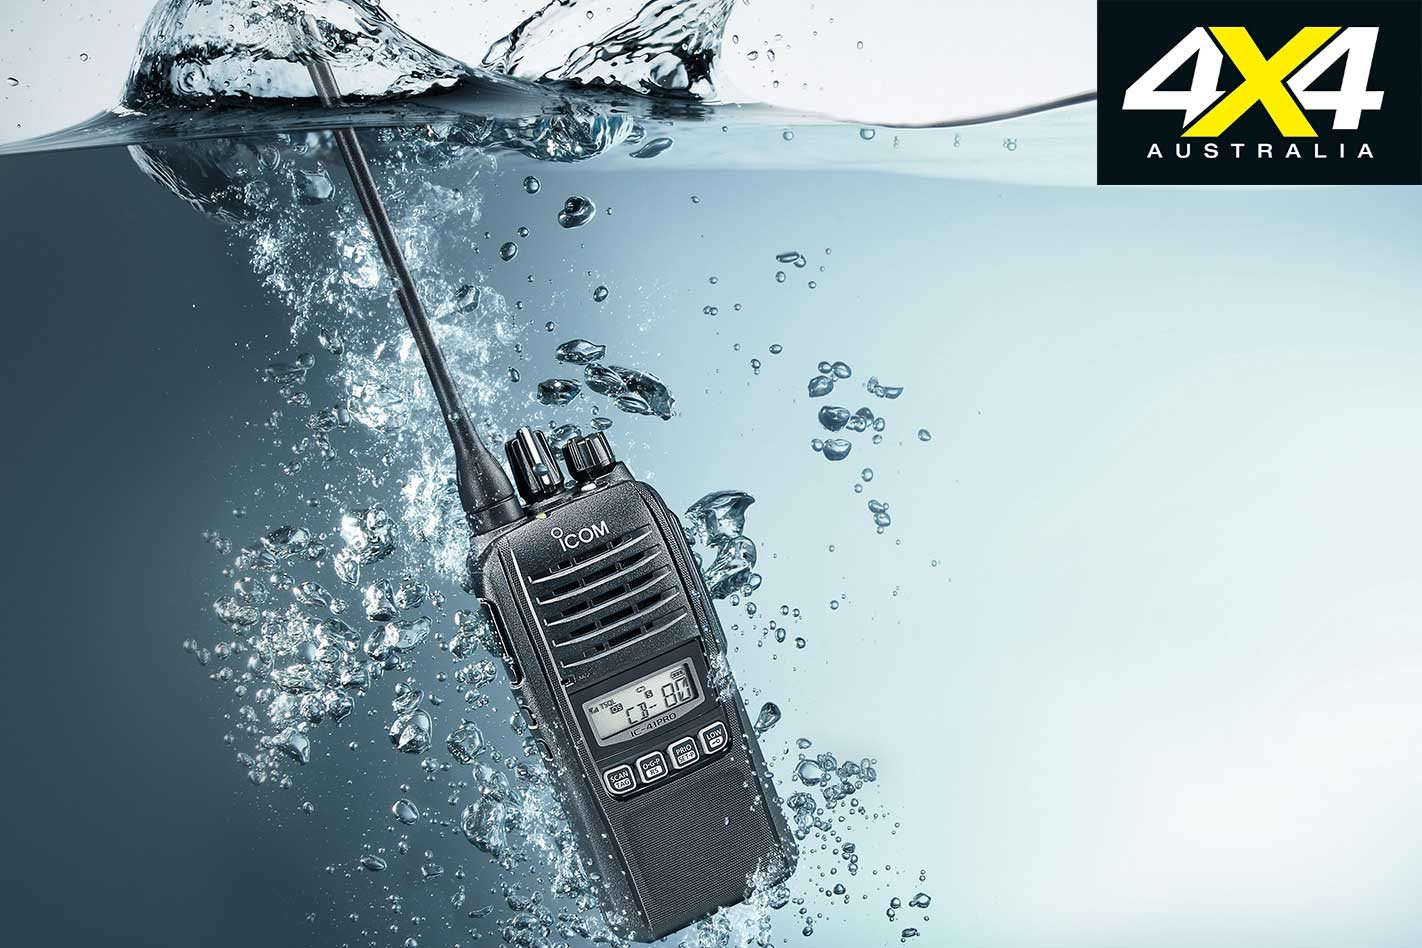 UHF Radios | 4x4 Australia Buyers' Guide